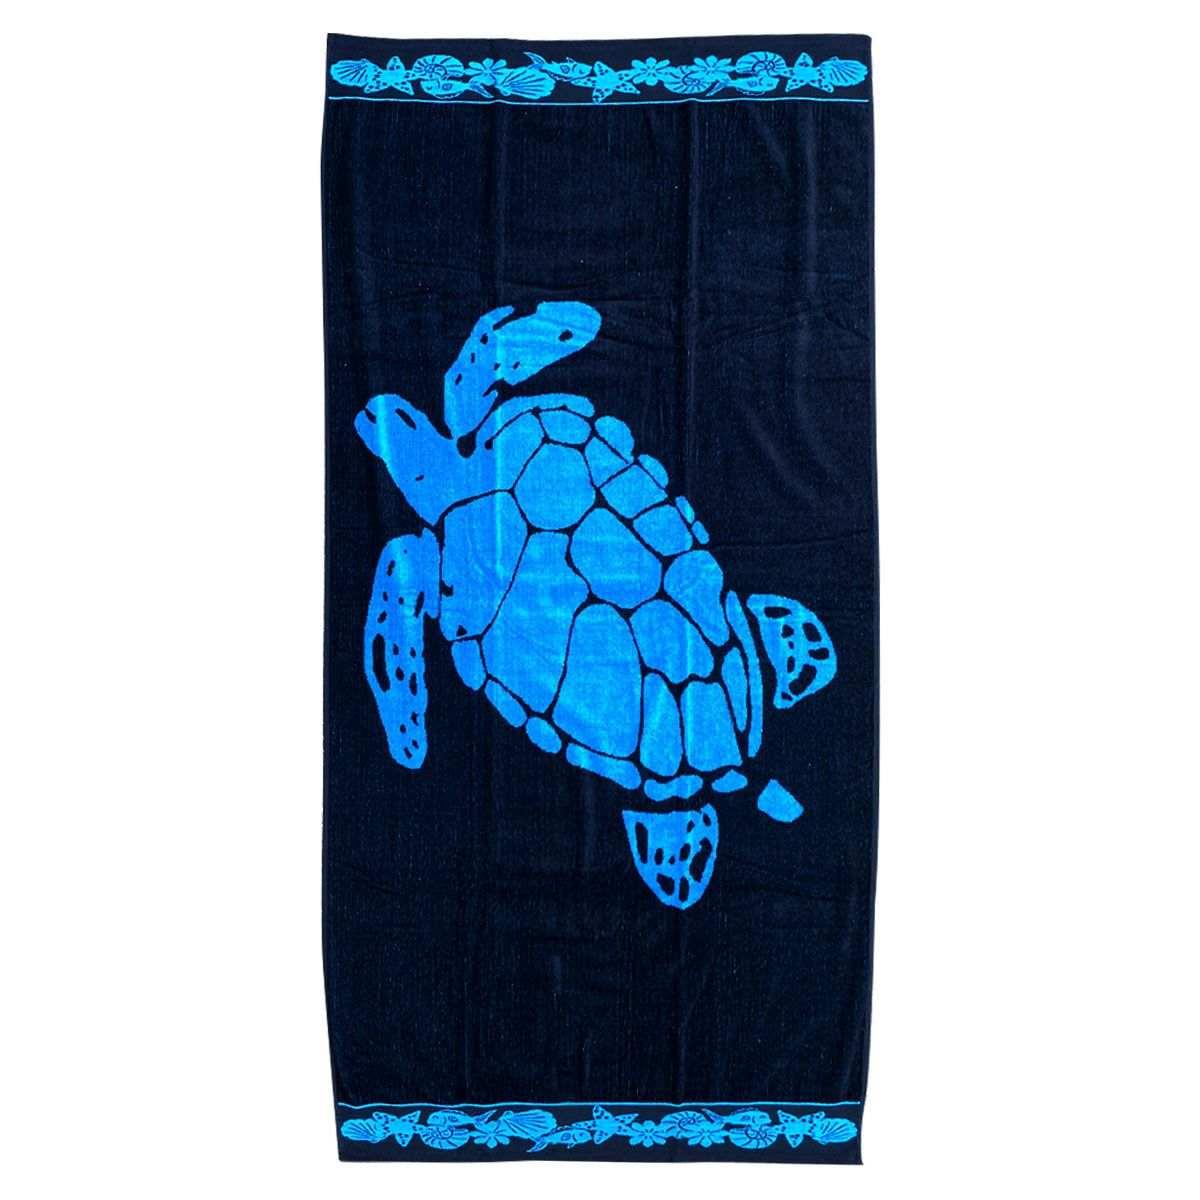 Drap Plage coton égyptien - Hawaiï